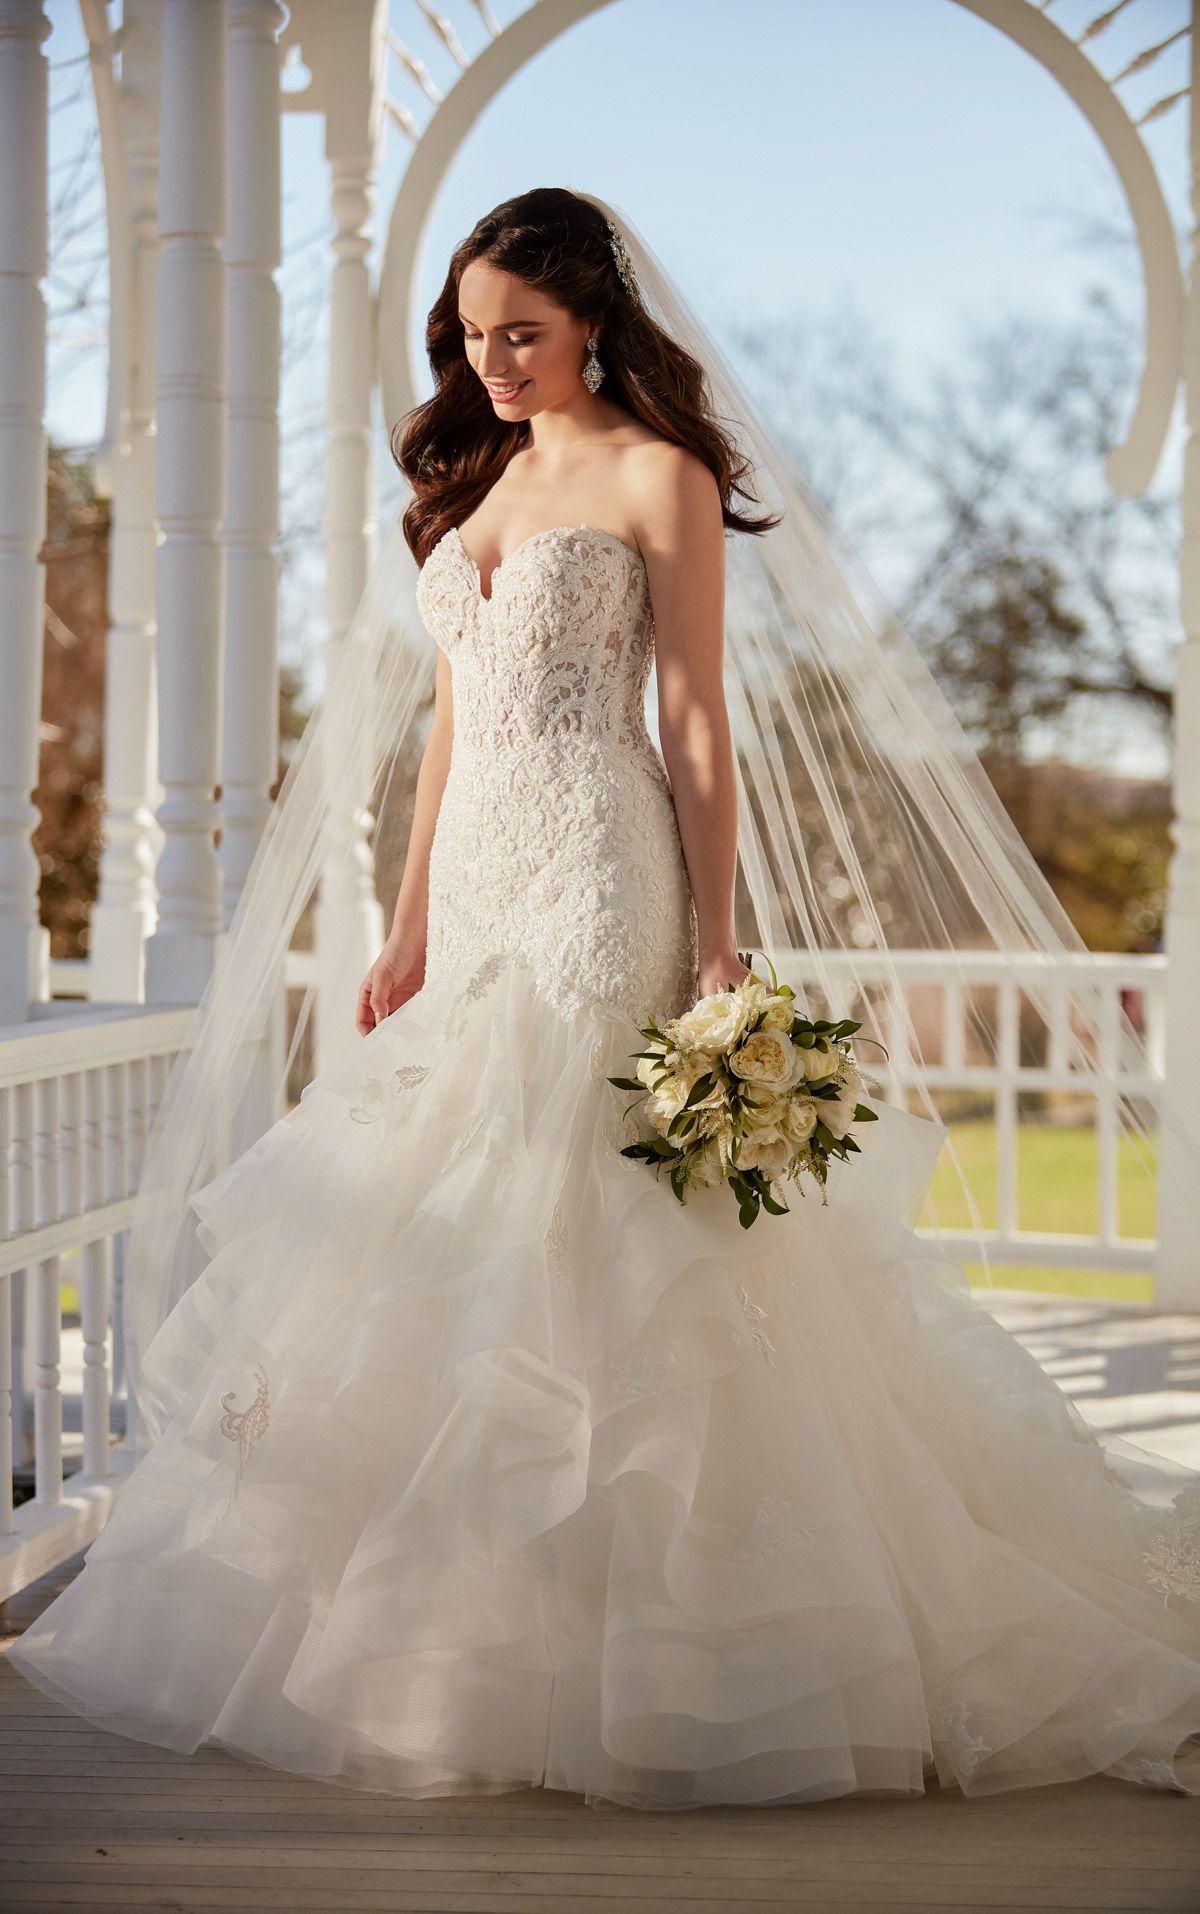 Wedding Dresses Fairytale Beaded Princess Wedding Gown Martina Liana Martina Liana Wedding Dress Wedding Dresses Mermaid Dresses [ 1914 x 1200 Pixel ]